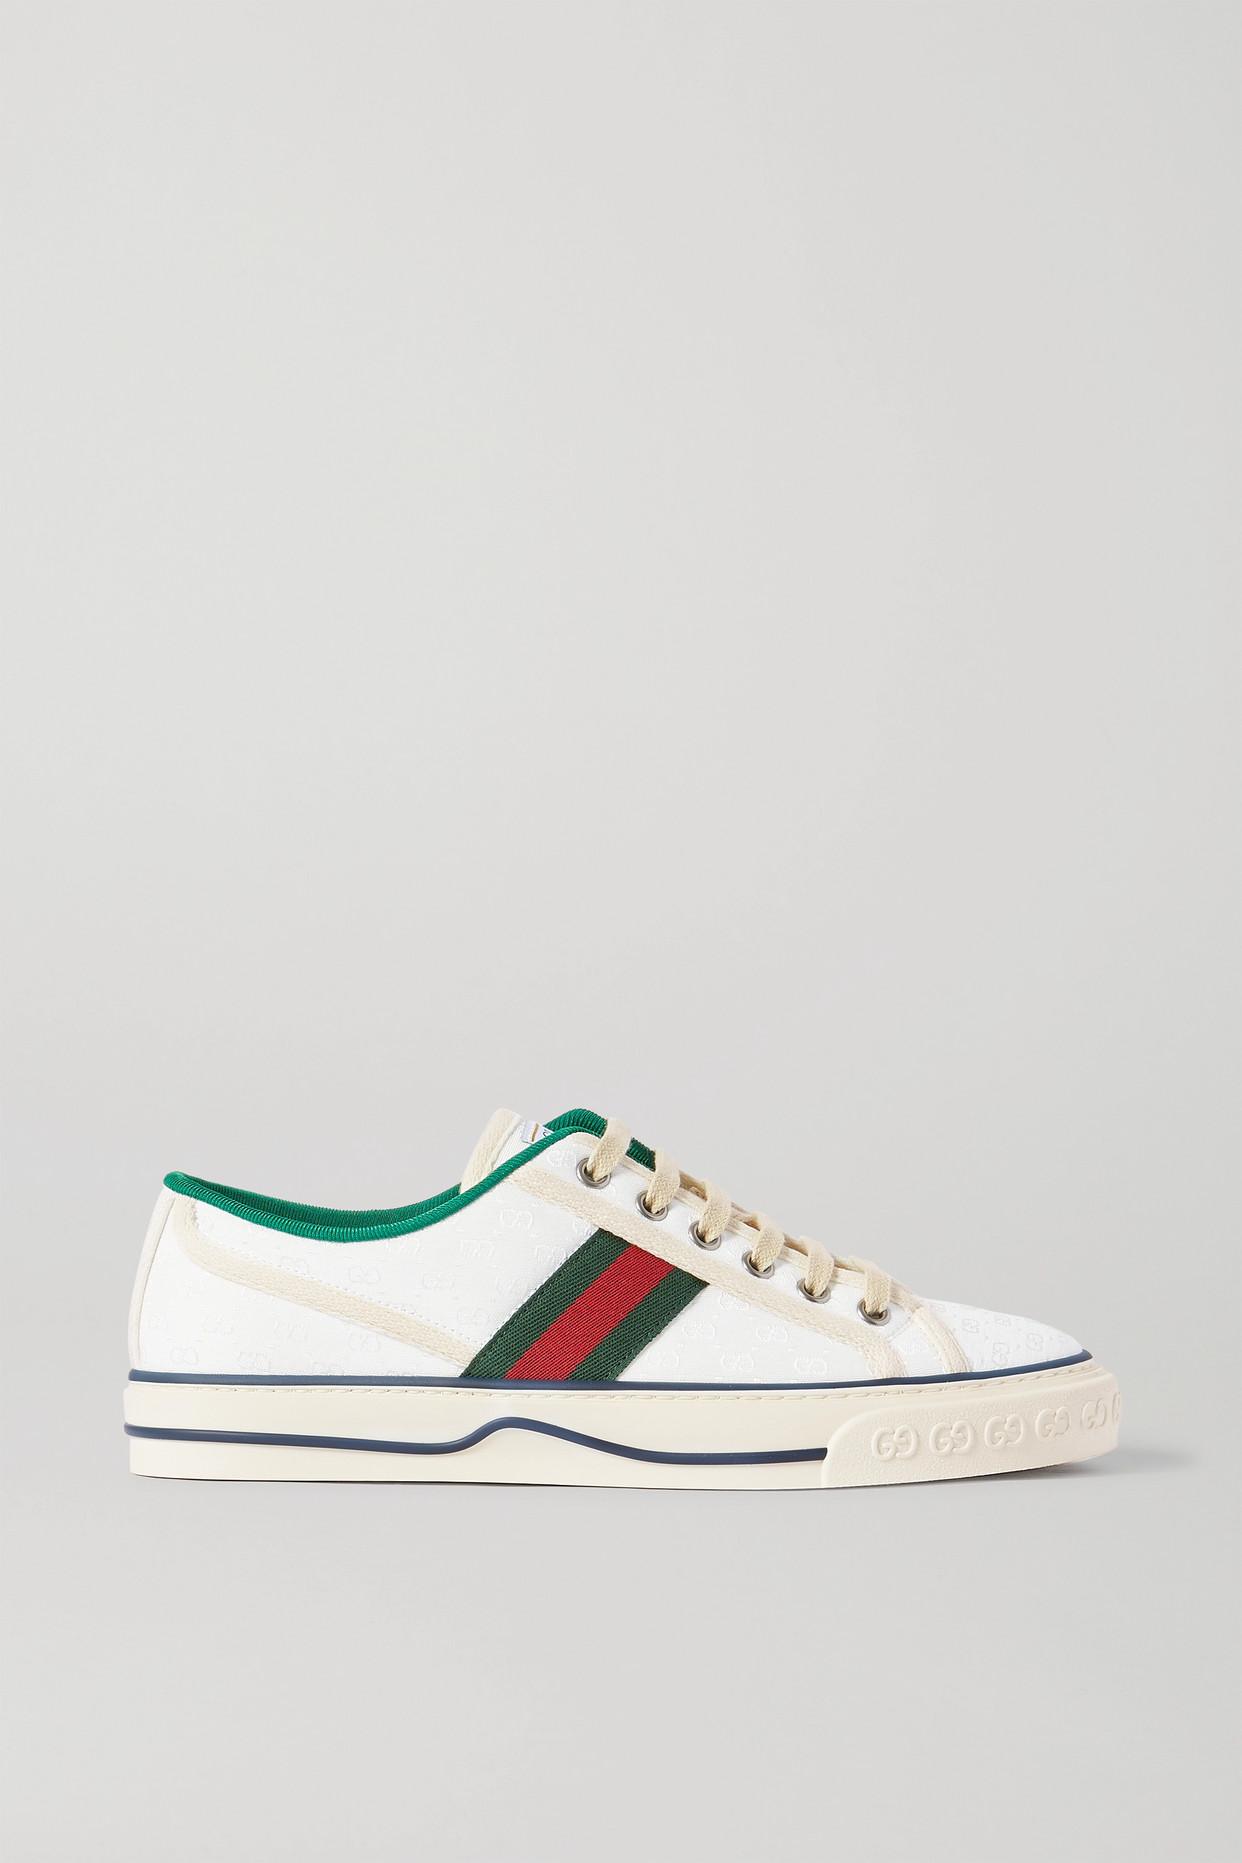 GUCCI - Tennis 1997 织带边饰品牌标志刺绣帆布运动鞋 - 白色 - IT35